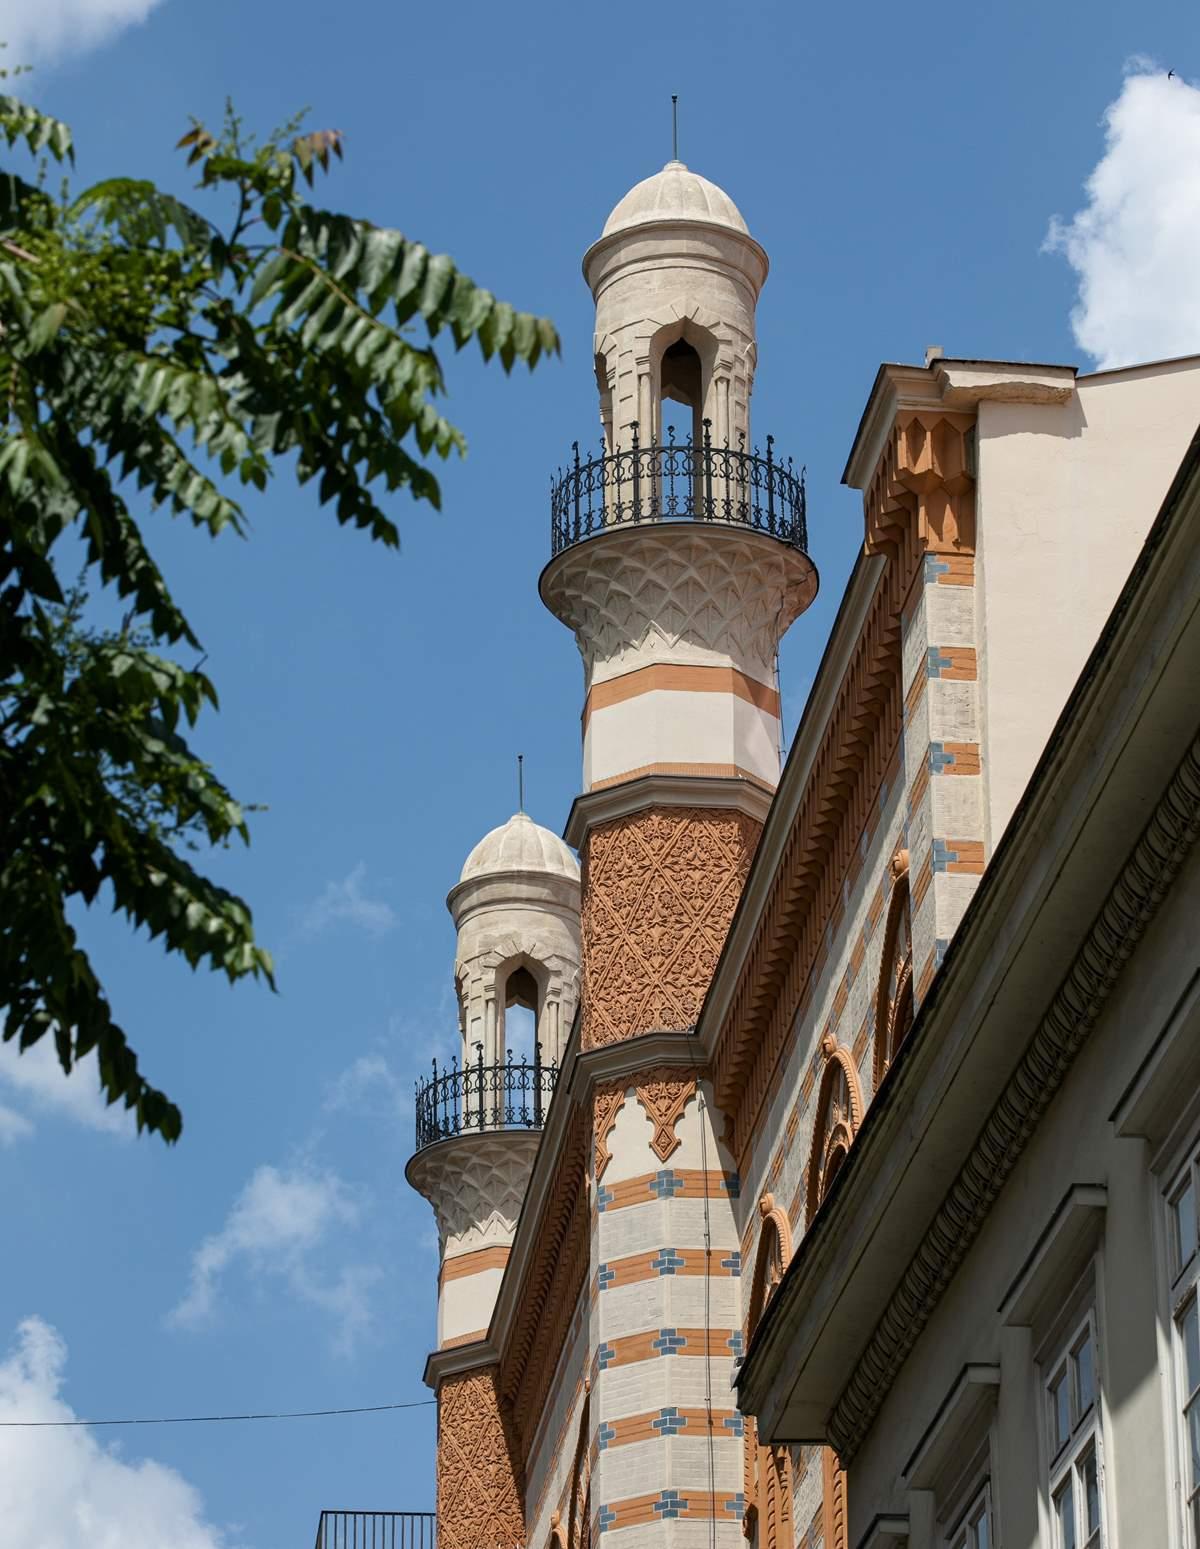 Rumbach utcai zsinagóga